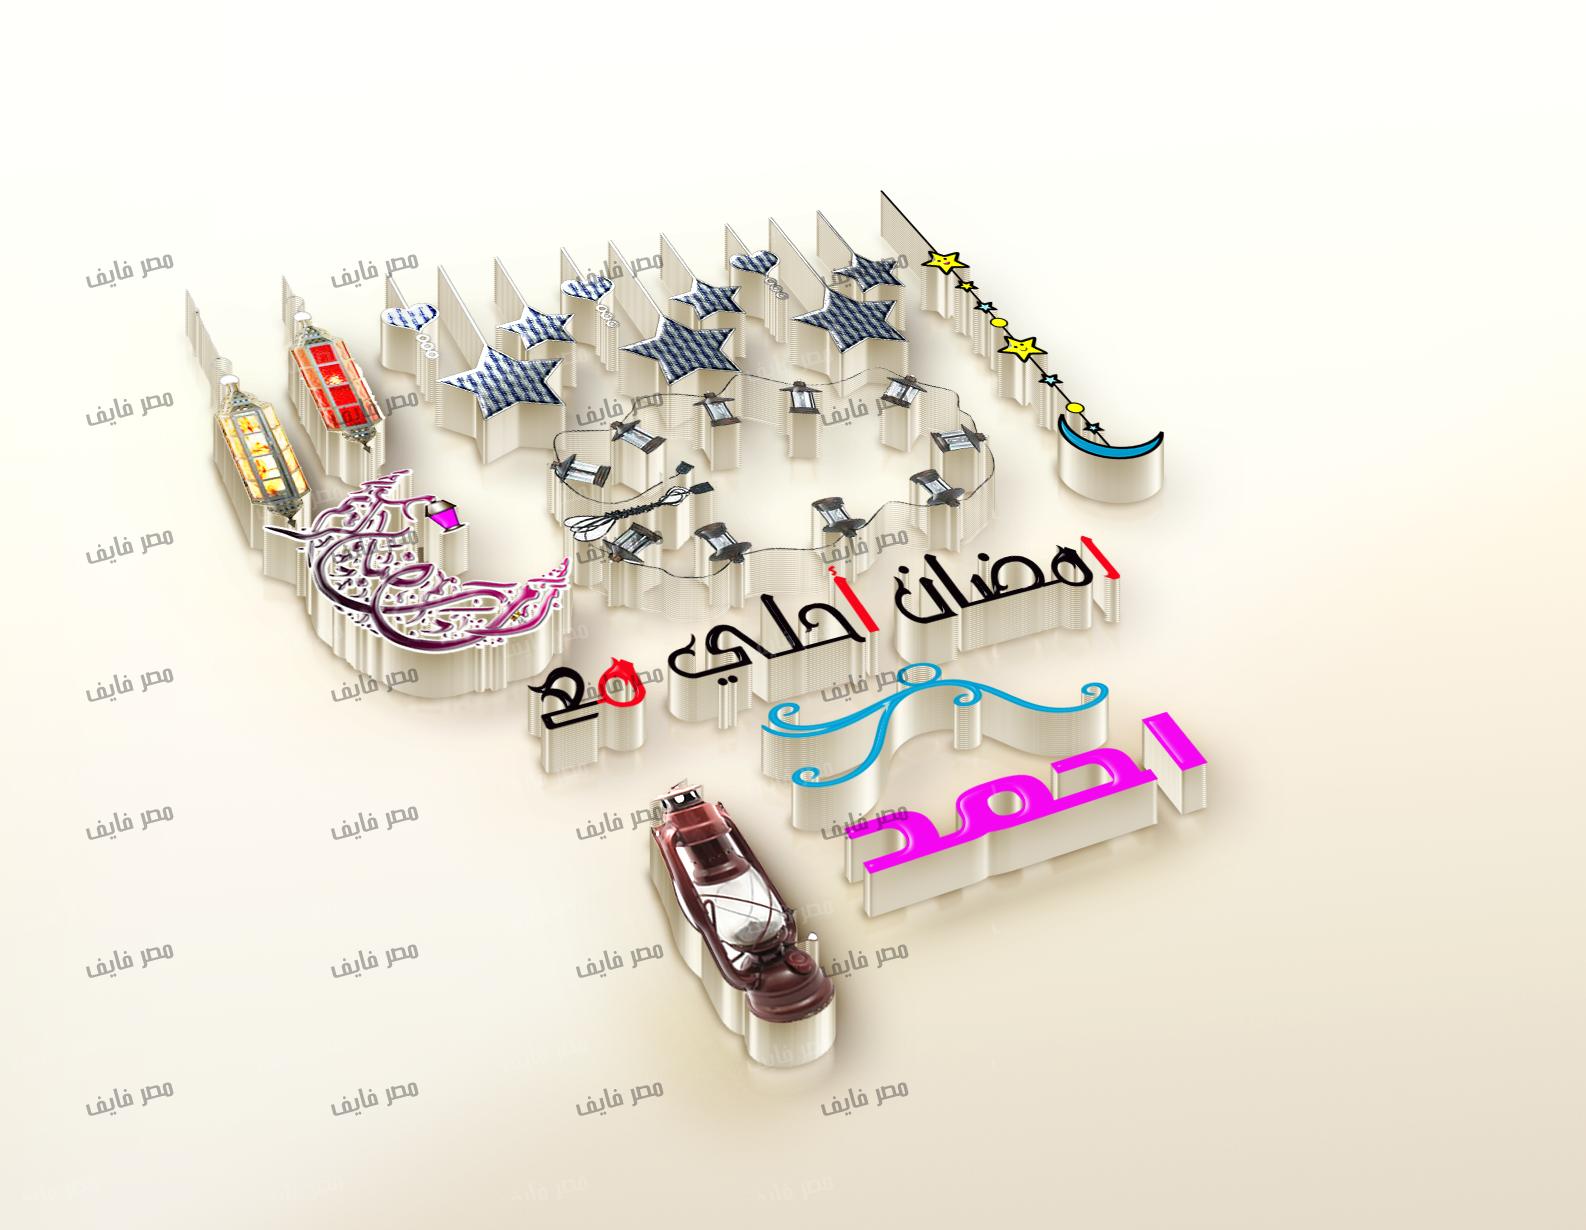 صور رمضان 2020 أجمل صور فوانيس رمضان 2021 بطاقات تهنئة لرمضان تهنئة رمضان بالأسماء 1